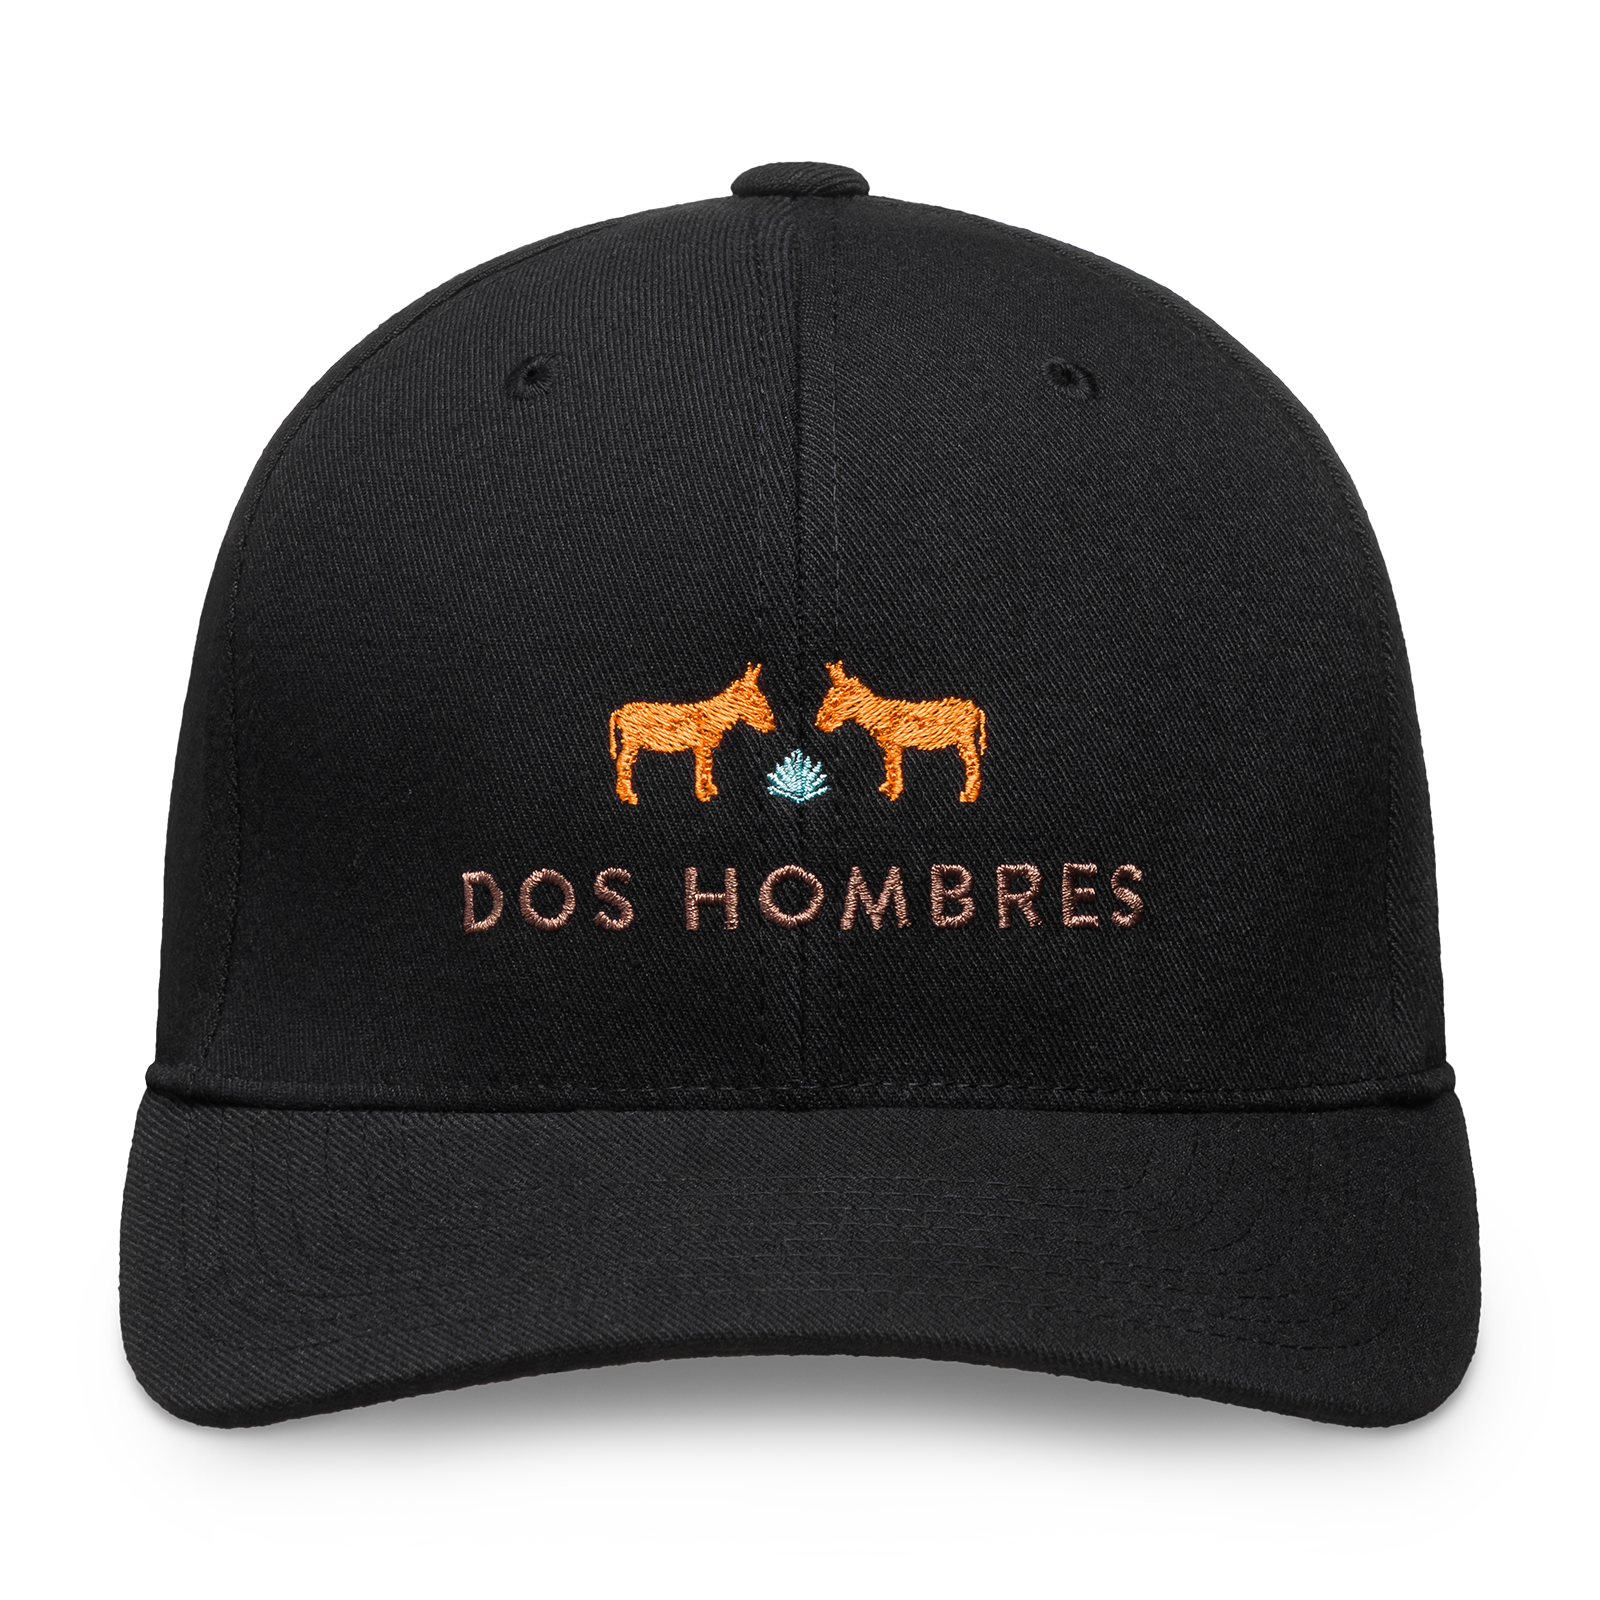 Baseball cap product image